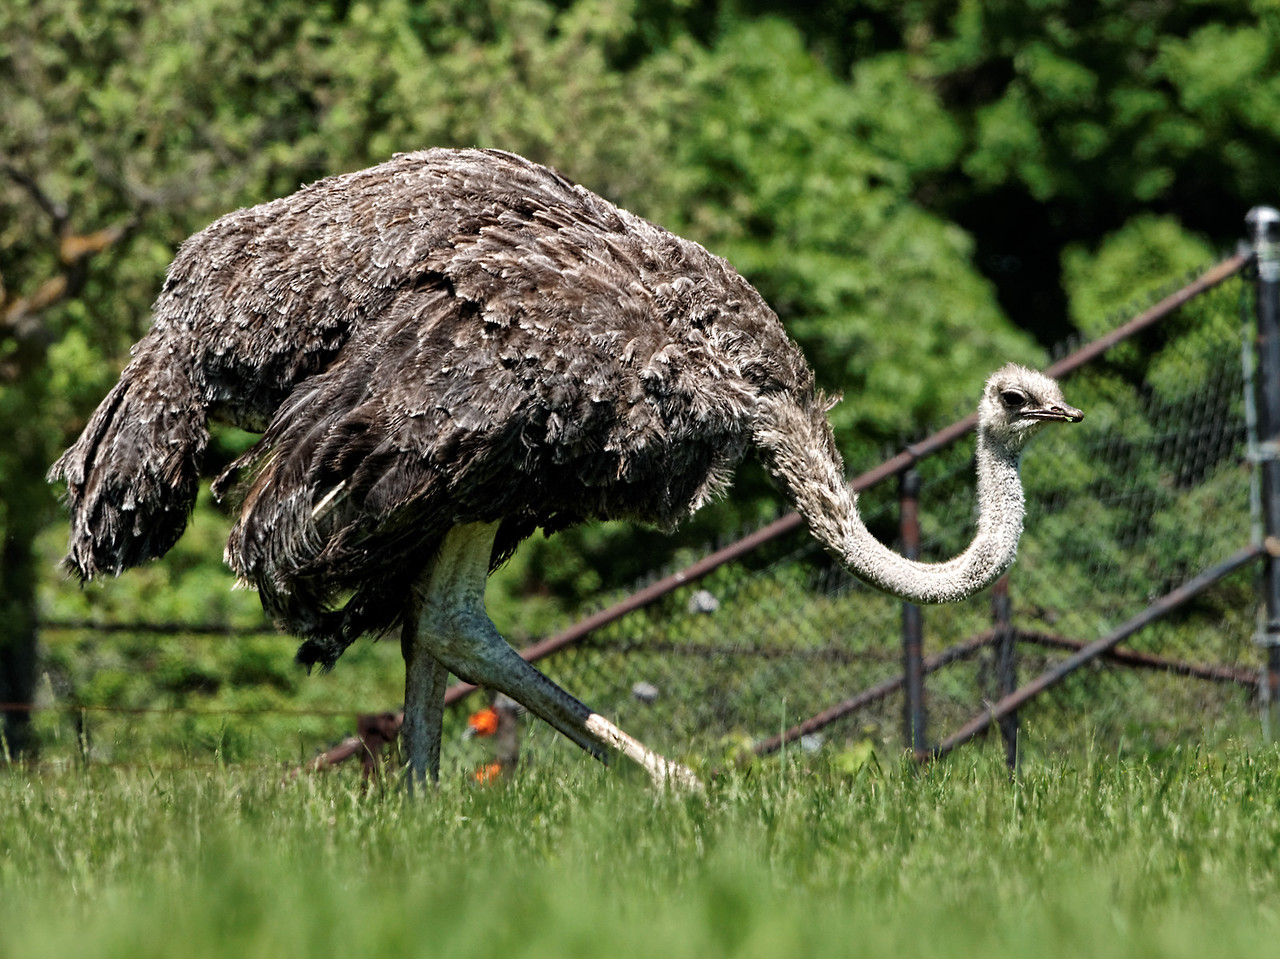 2011-06-02 - Toronto Zoo - 005